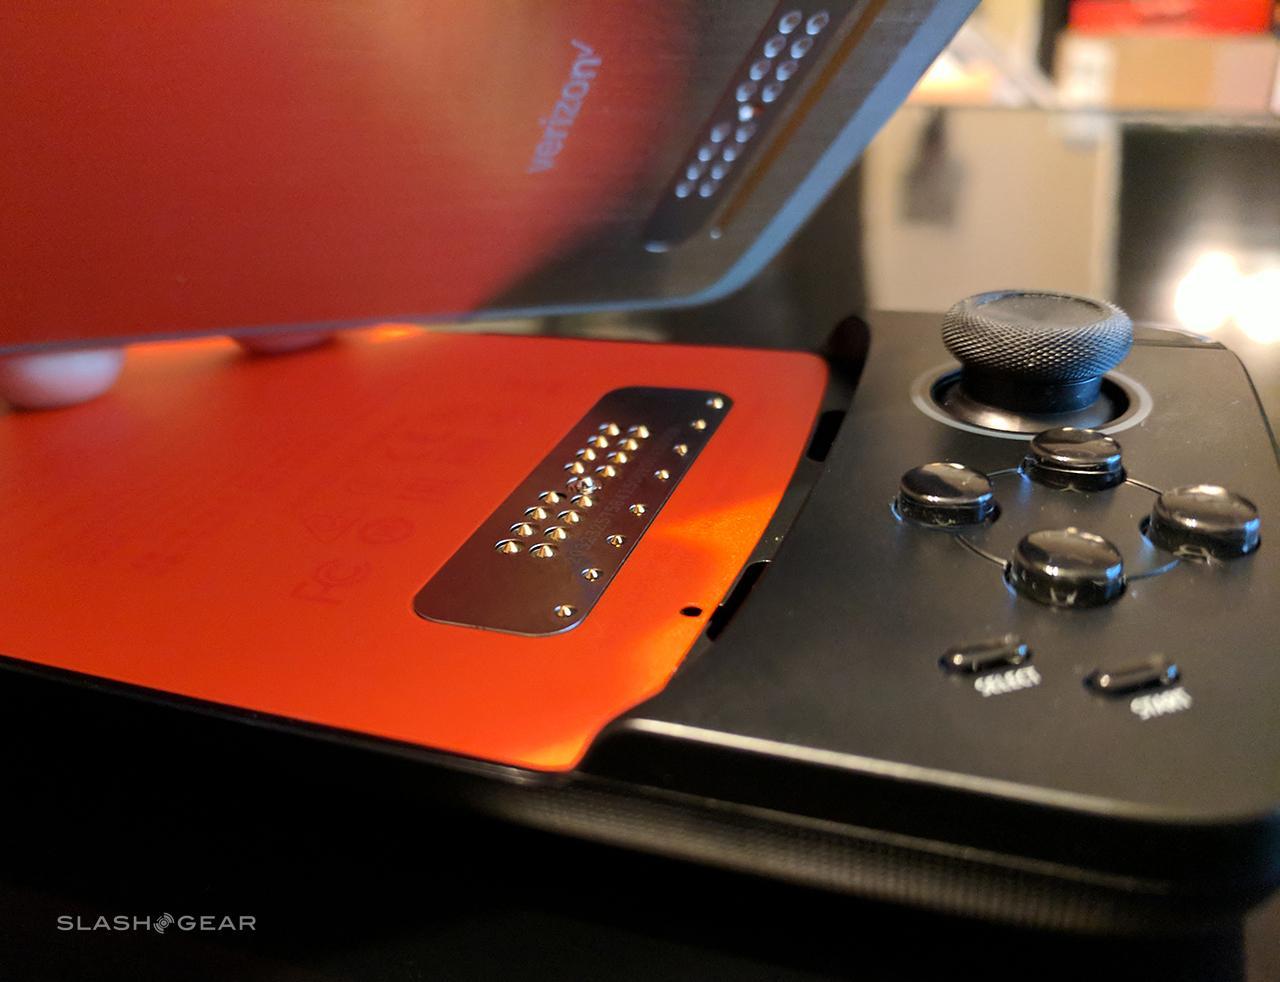 Motorola Gamepad Moto Mod Review: Great for tiny hands - SlashGear